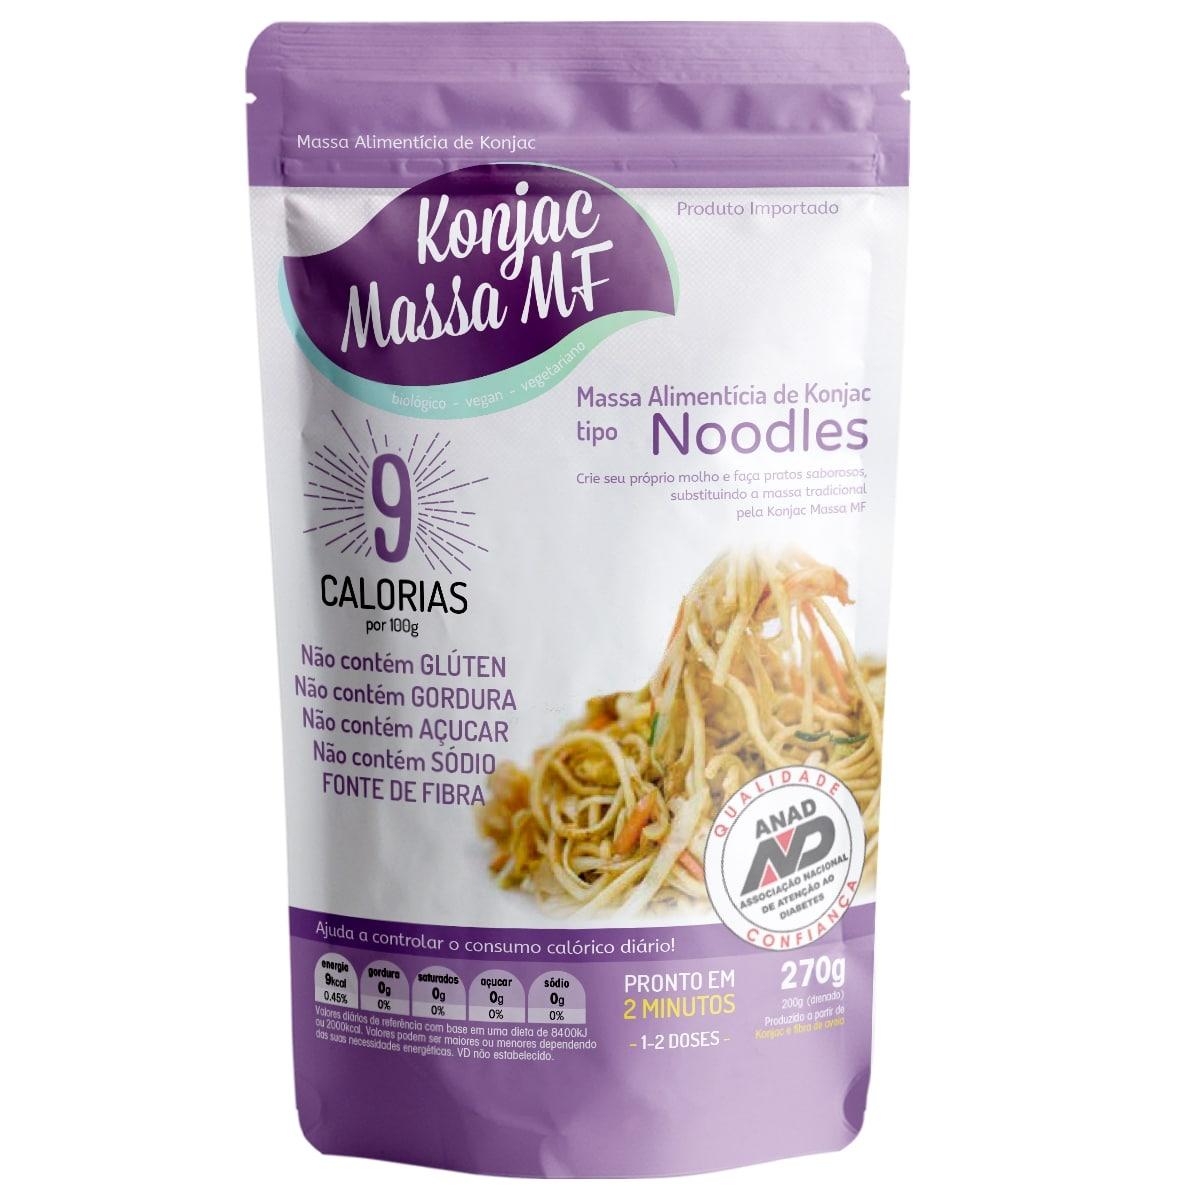 3 Noodles Milagroso Konjac  270g 9 Kcal Emagreça Comendo